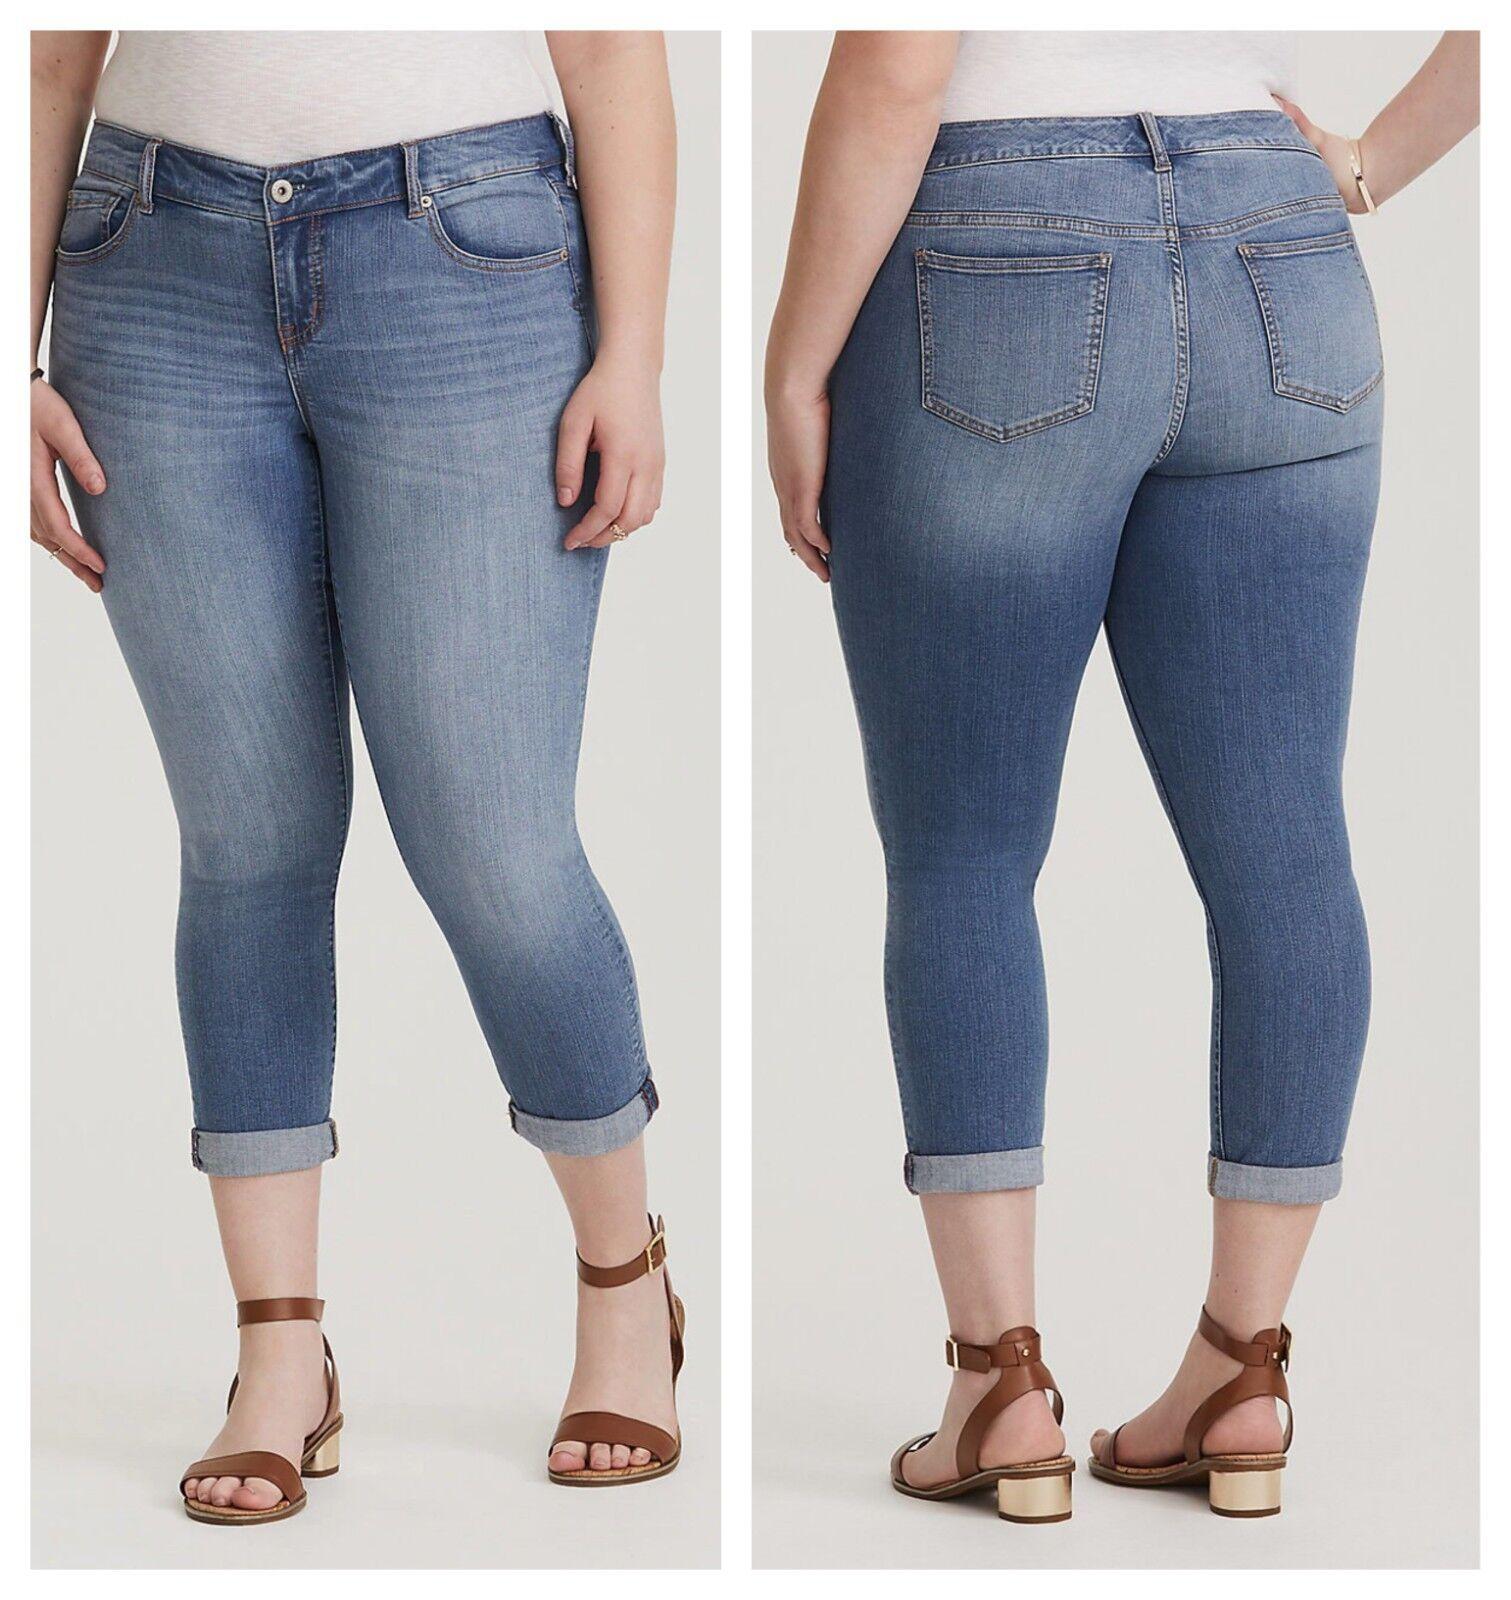 Torrid Premium Stretch Cropped Jeans Light Wash 4X 26